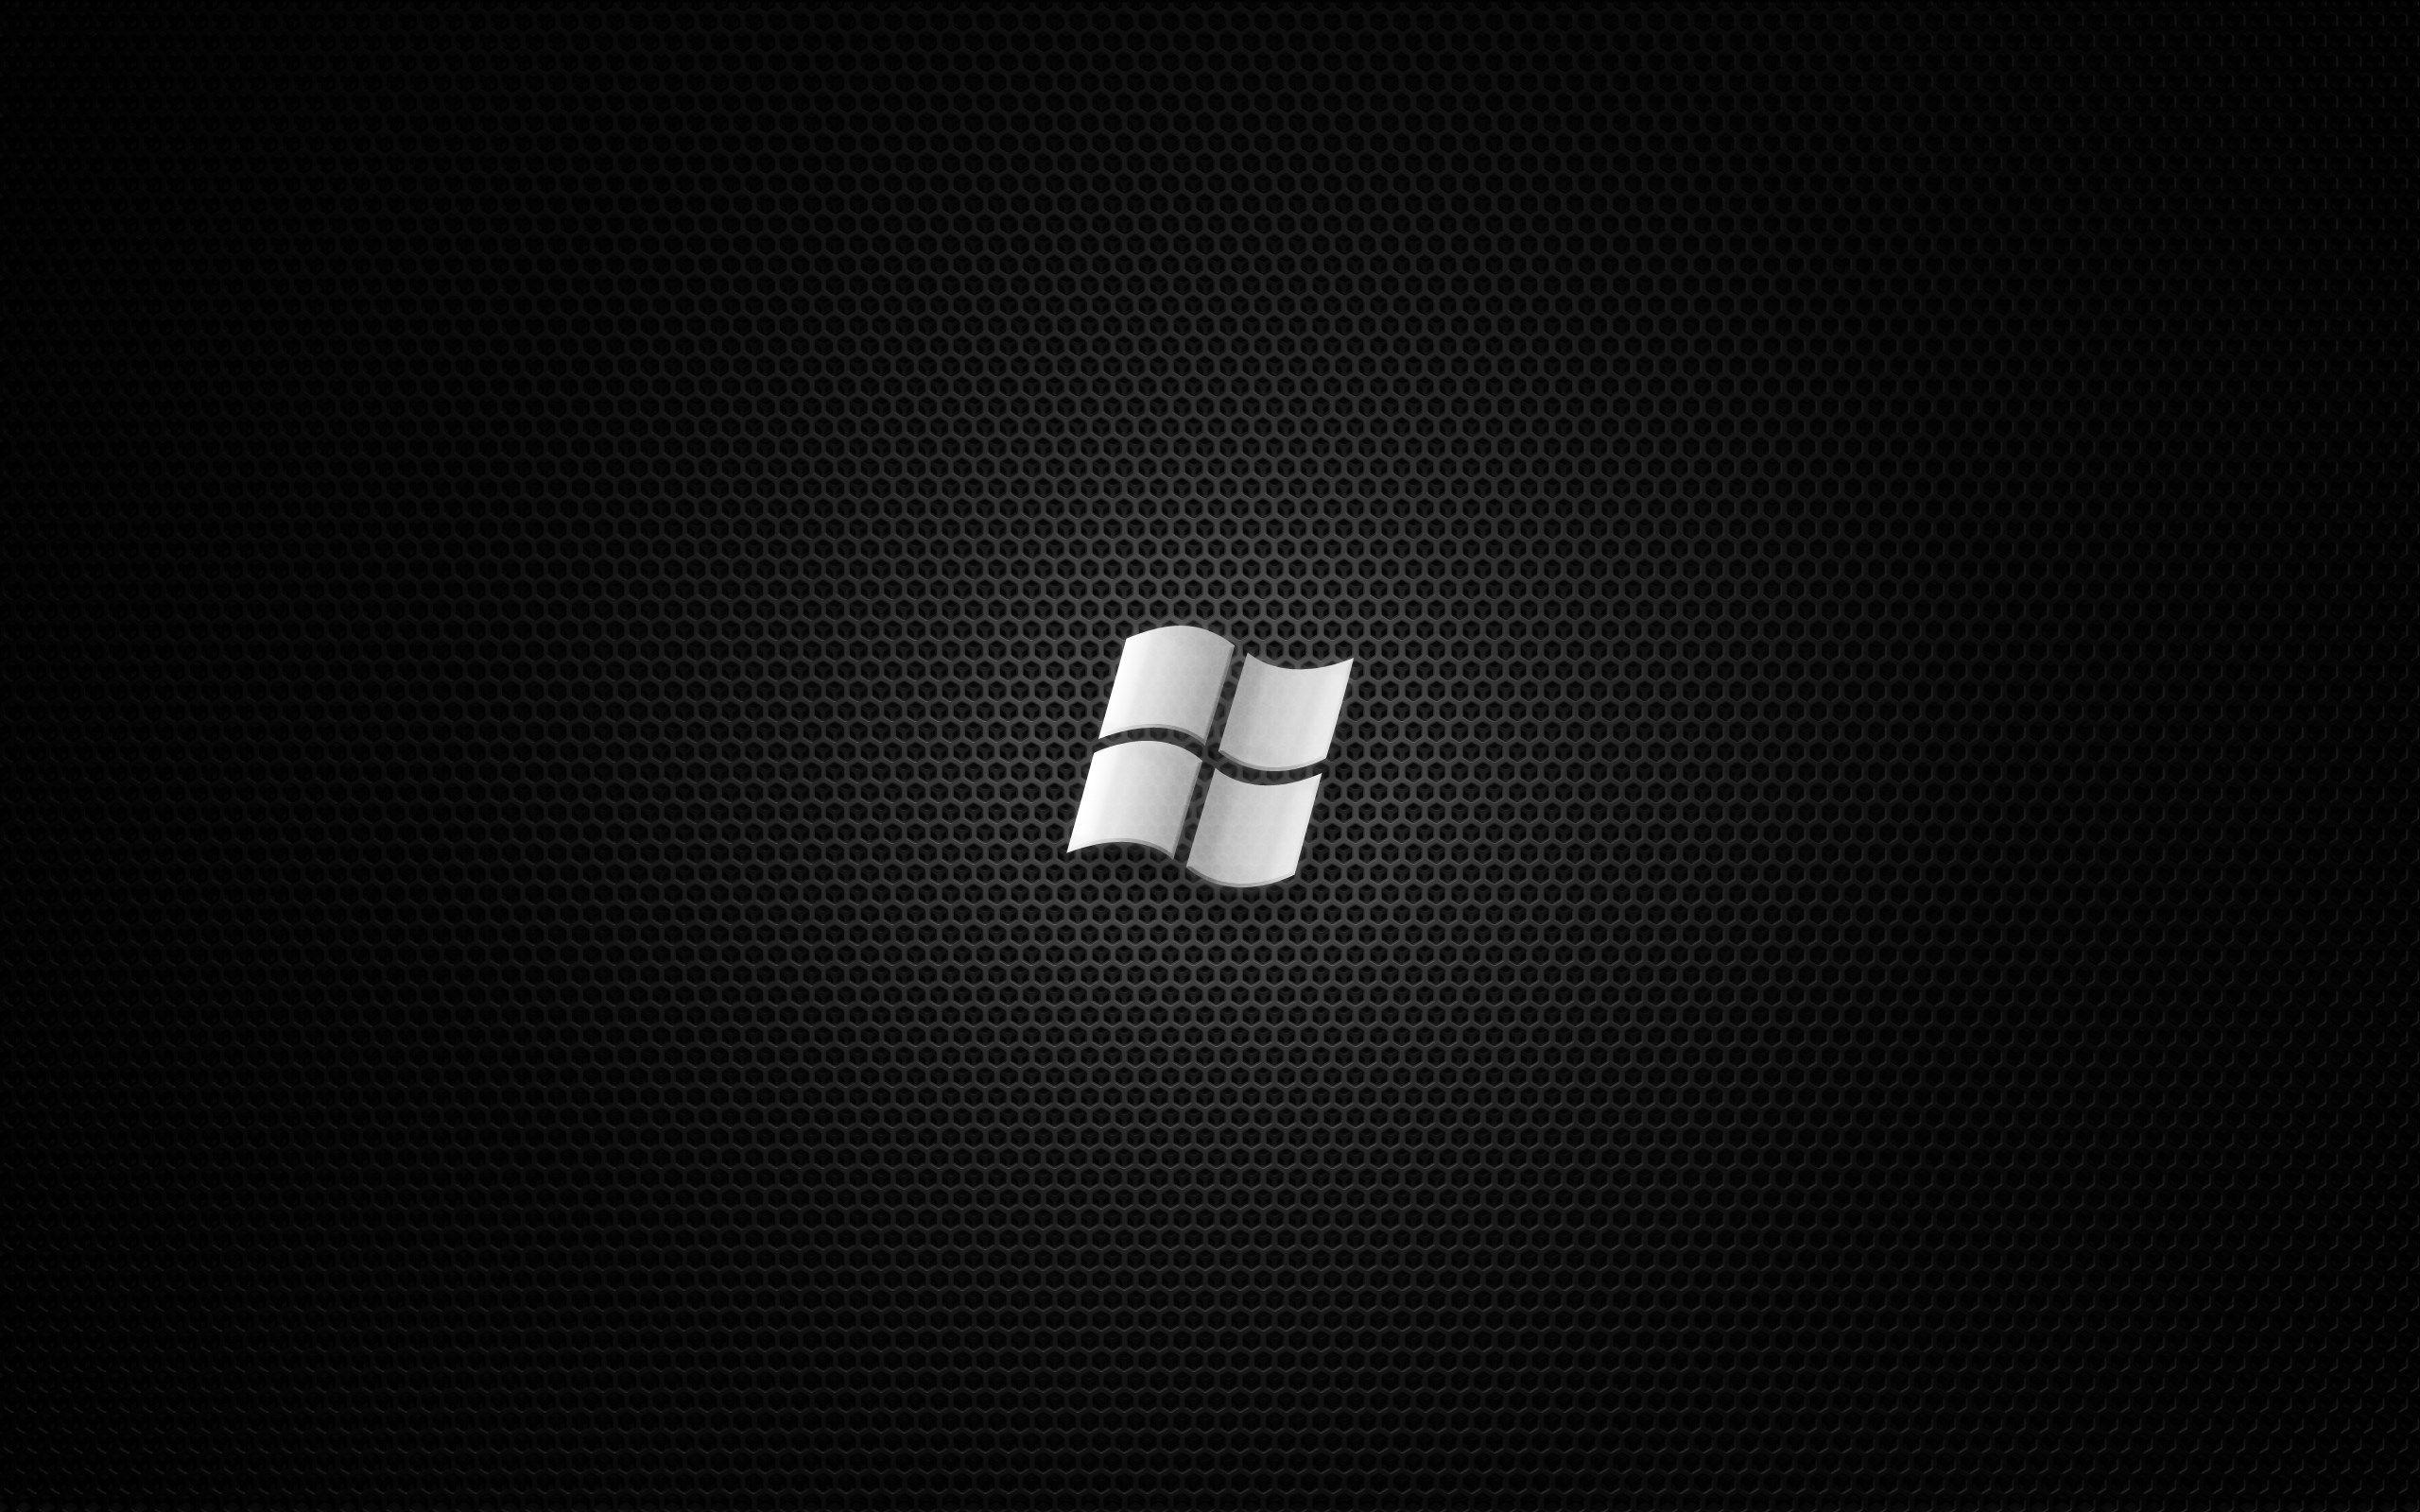 Windows 7 Wallpapers Wallpaper Pc Black Desktop Black Wallpaper